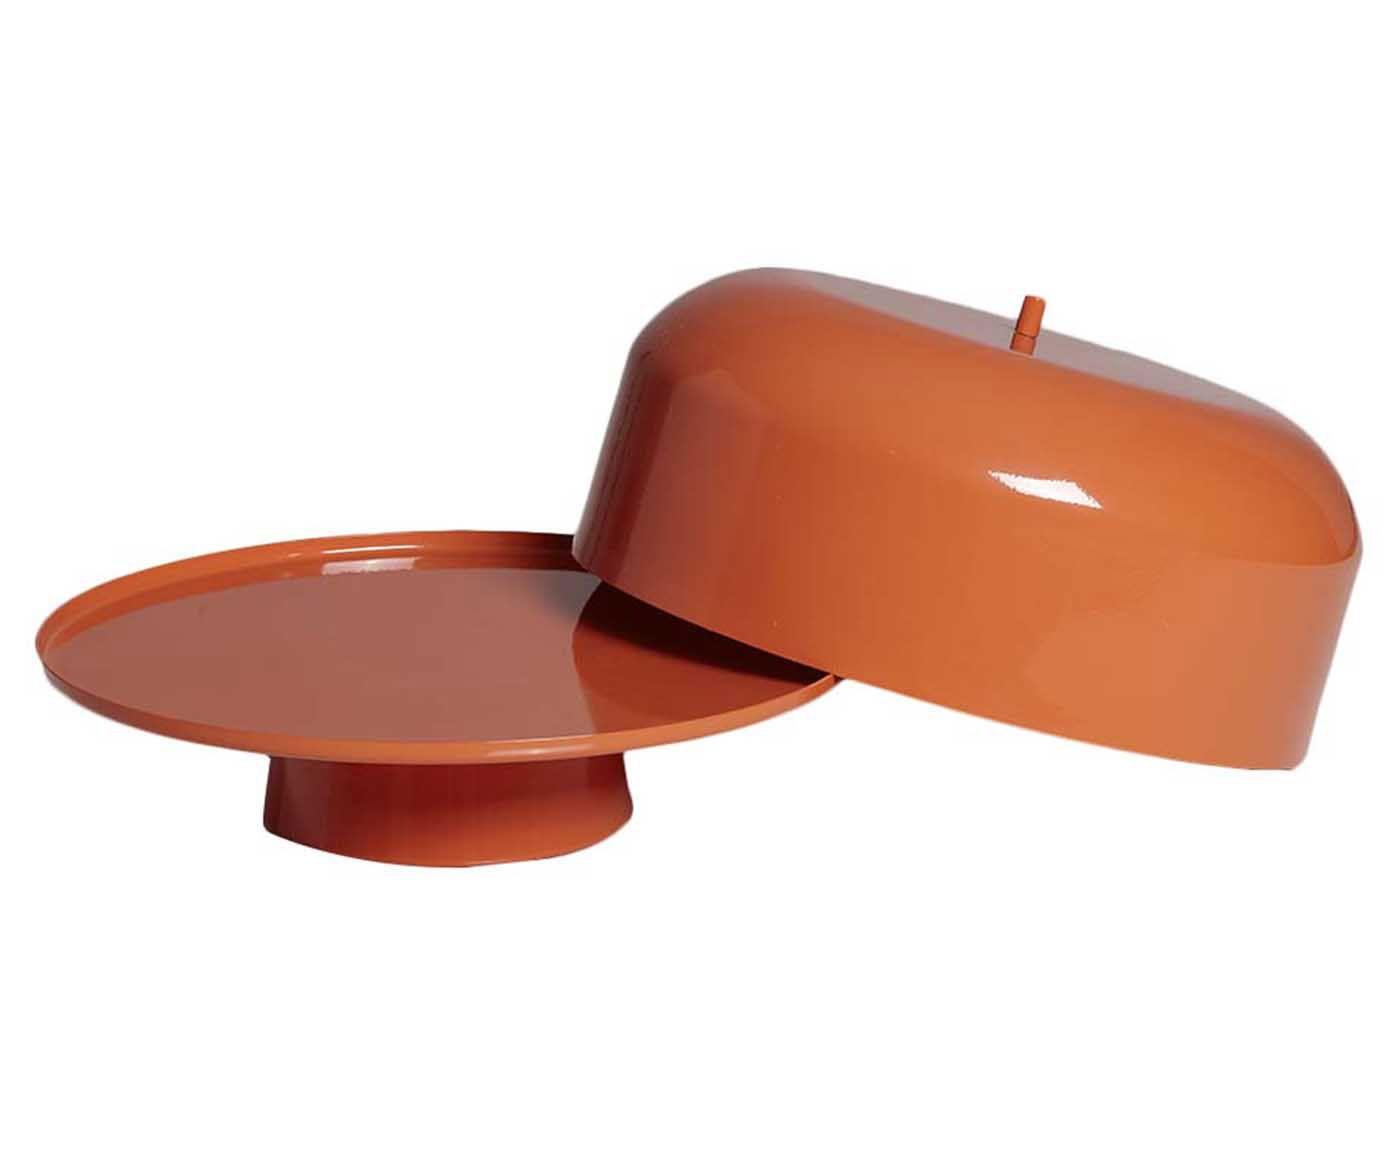 Boleira modern charm - hendrix | Westwing.com.br